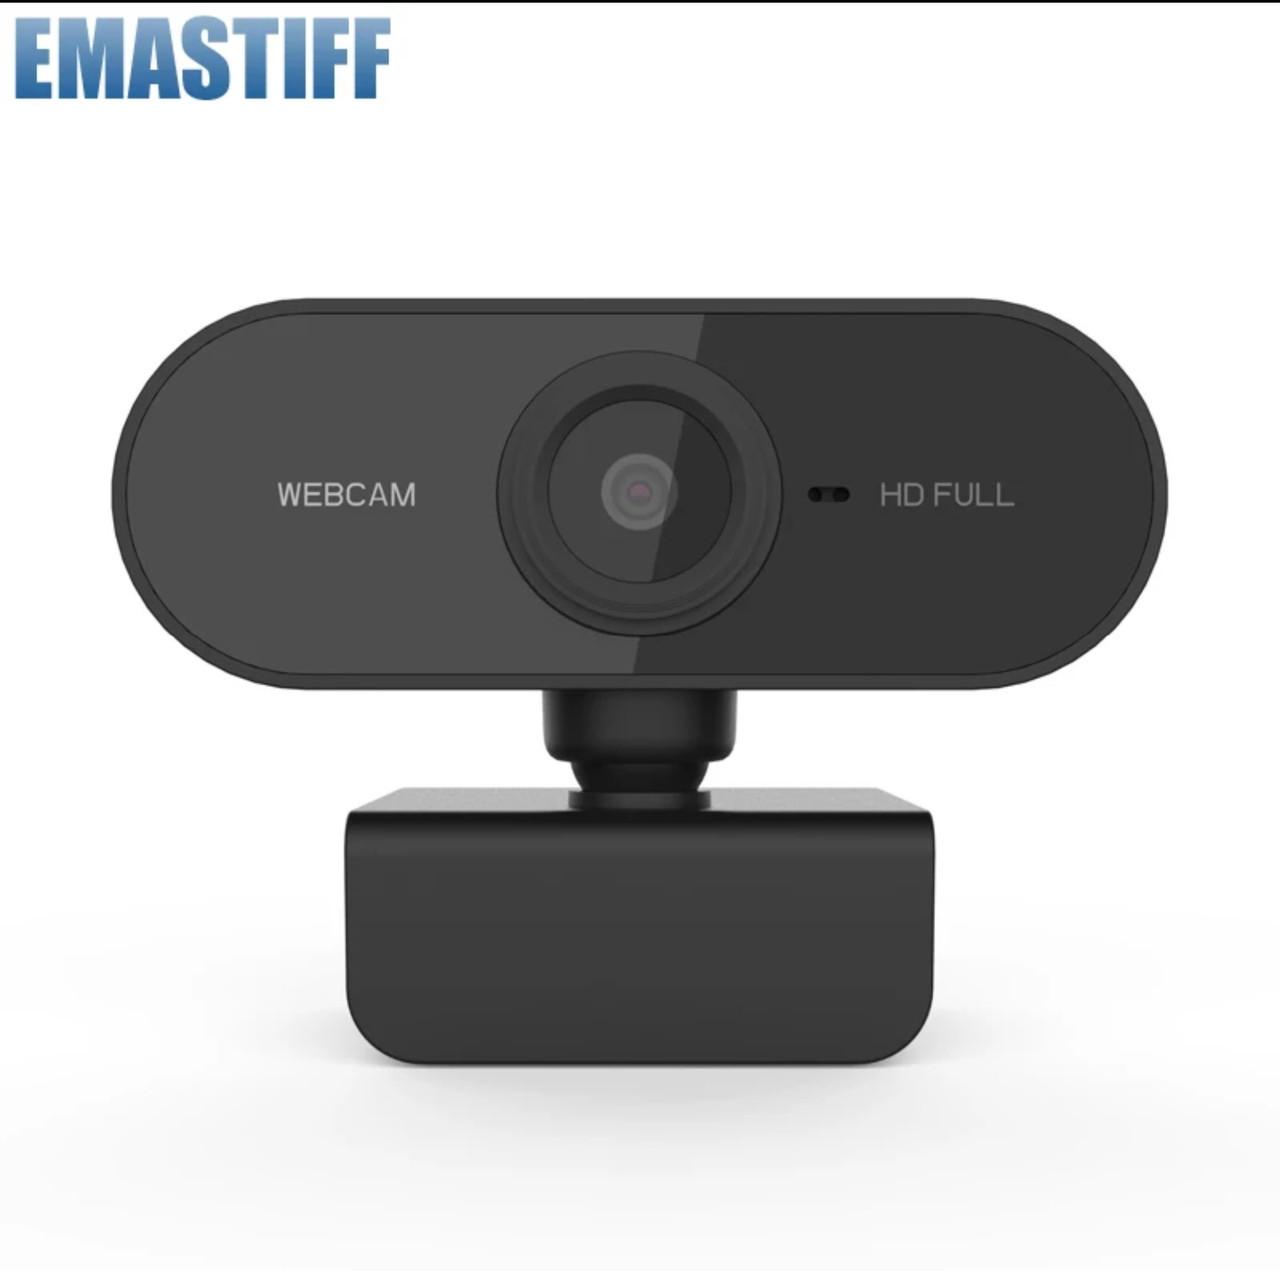 Веб камера eMastiff 1080P для видео звонков